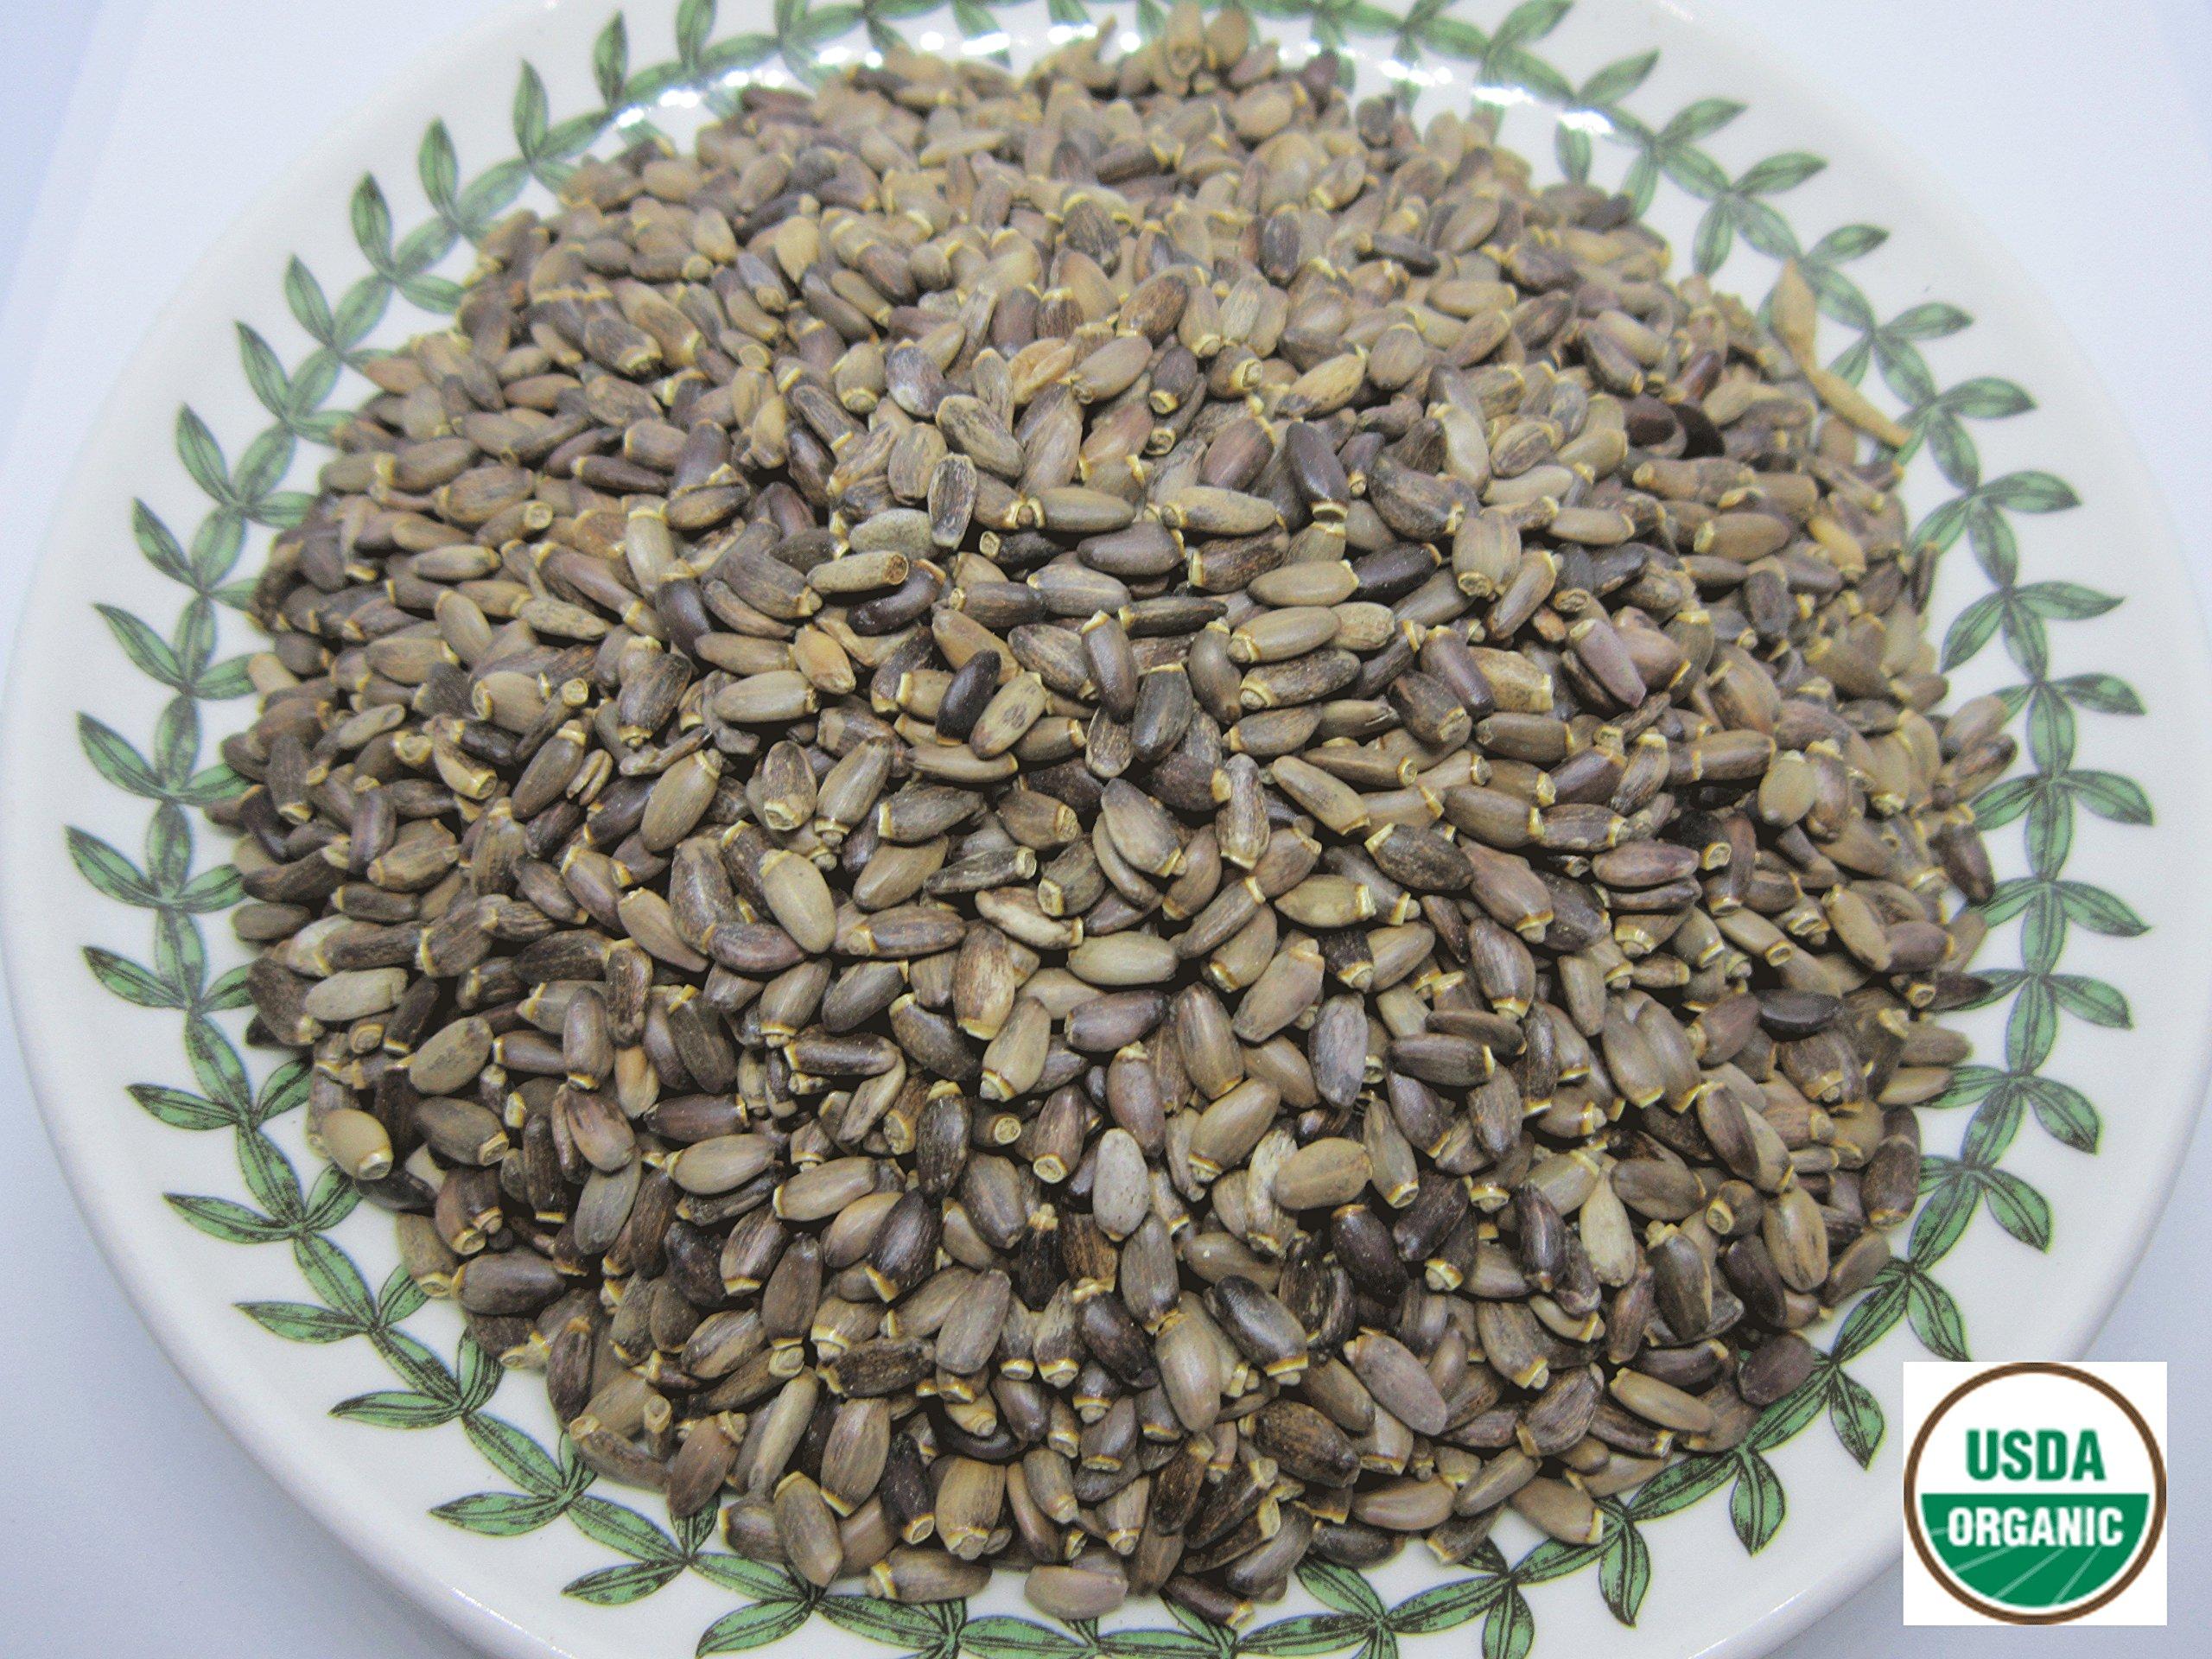 Organic Milk Thistle Seeds - Silybum marianum Loose Seeds 100% from Nature (08 oz)